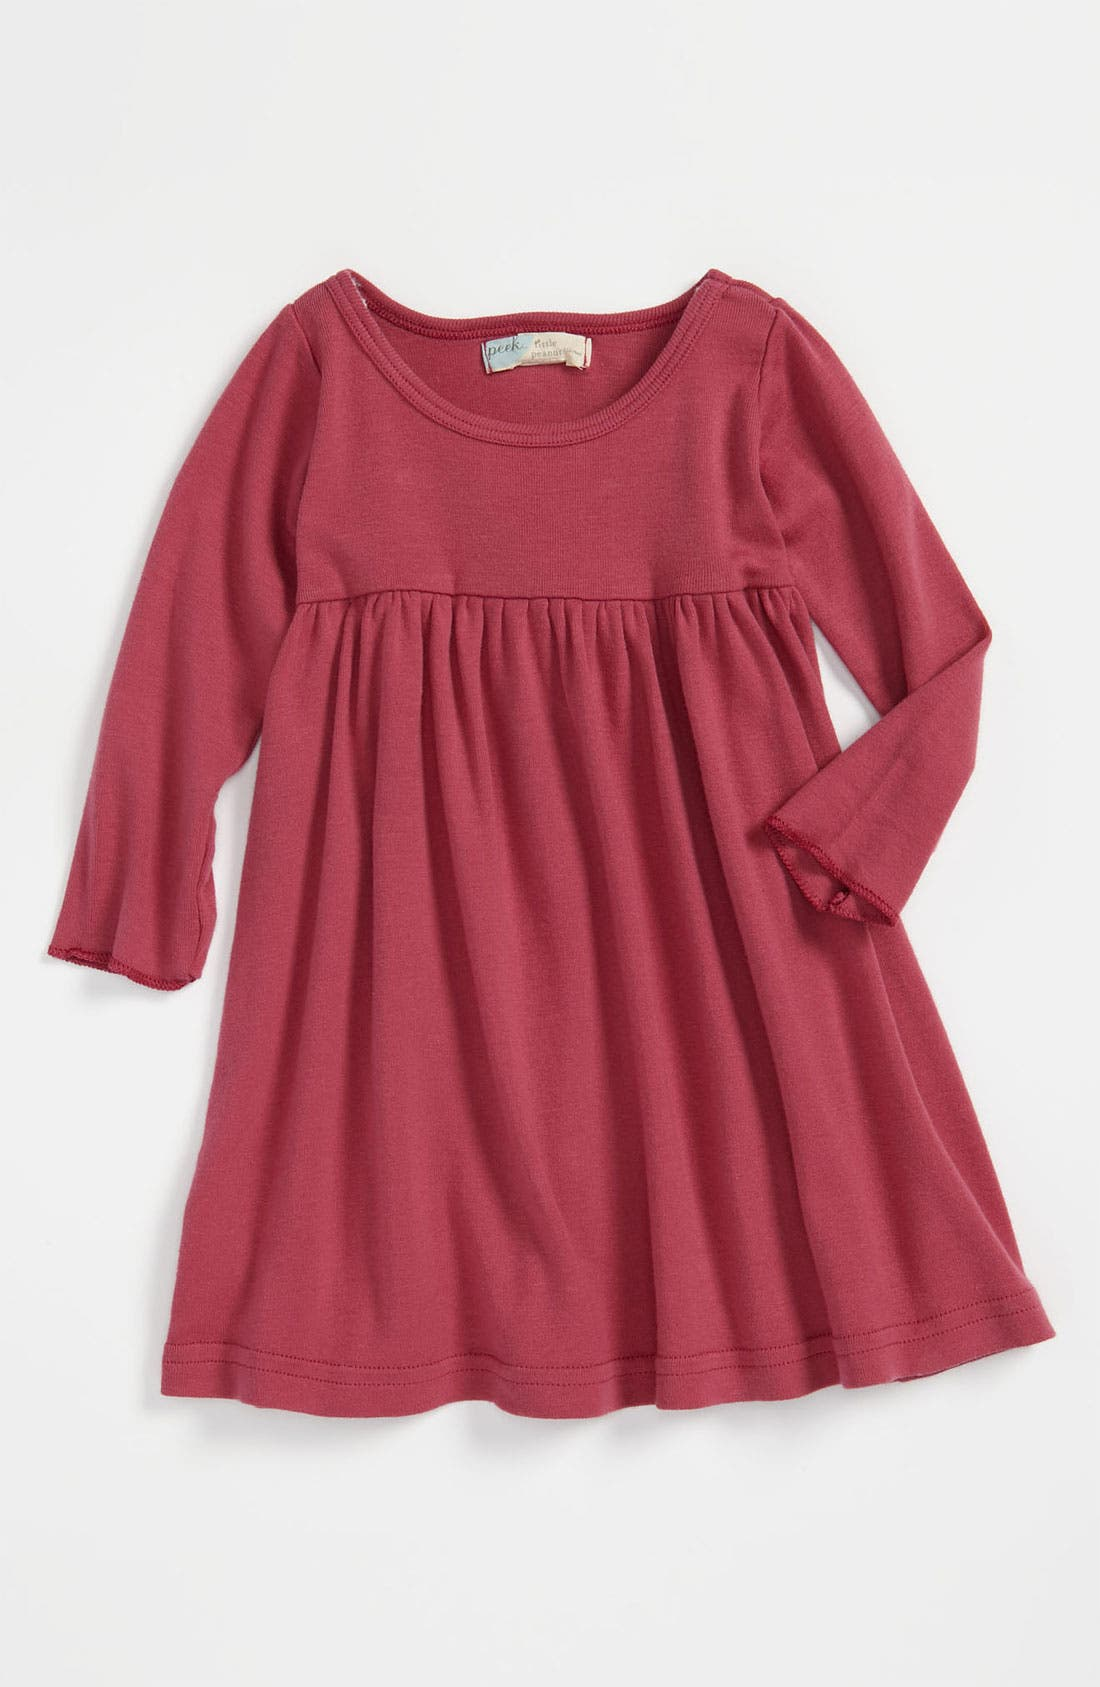 Main Image - Peek Long Sleeve Dress (Infant)